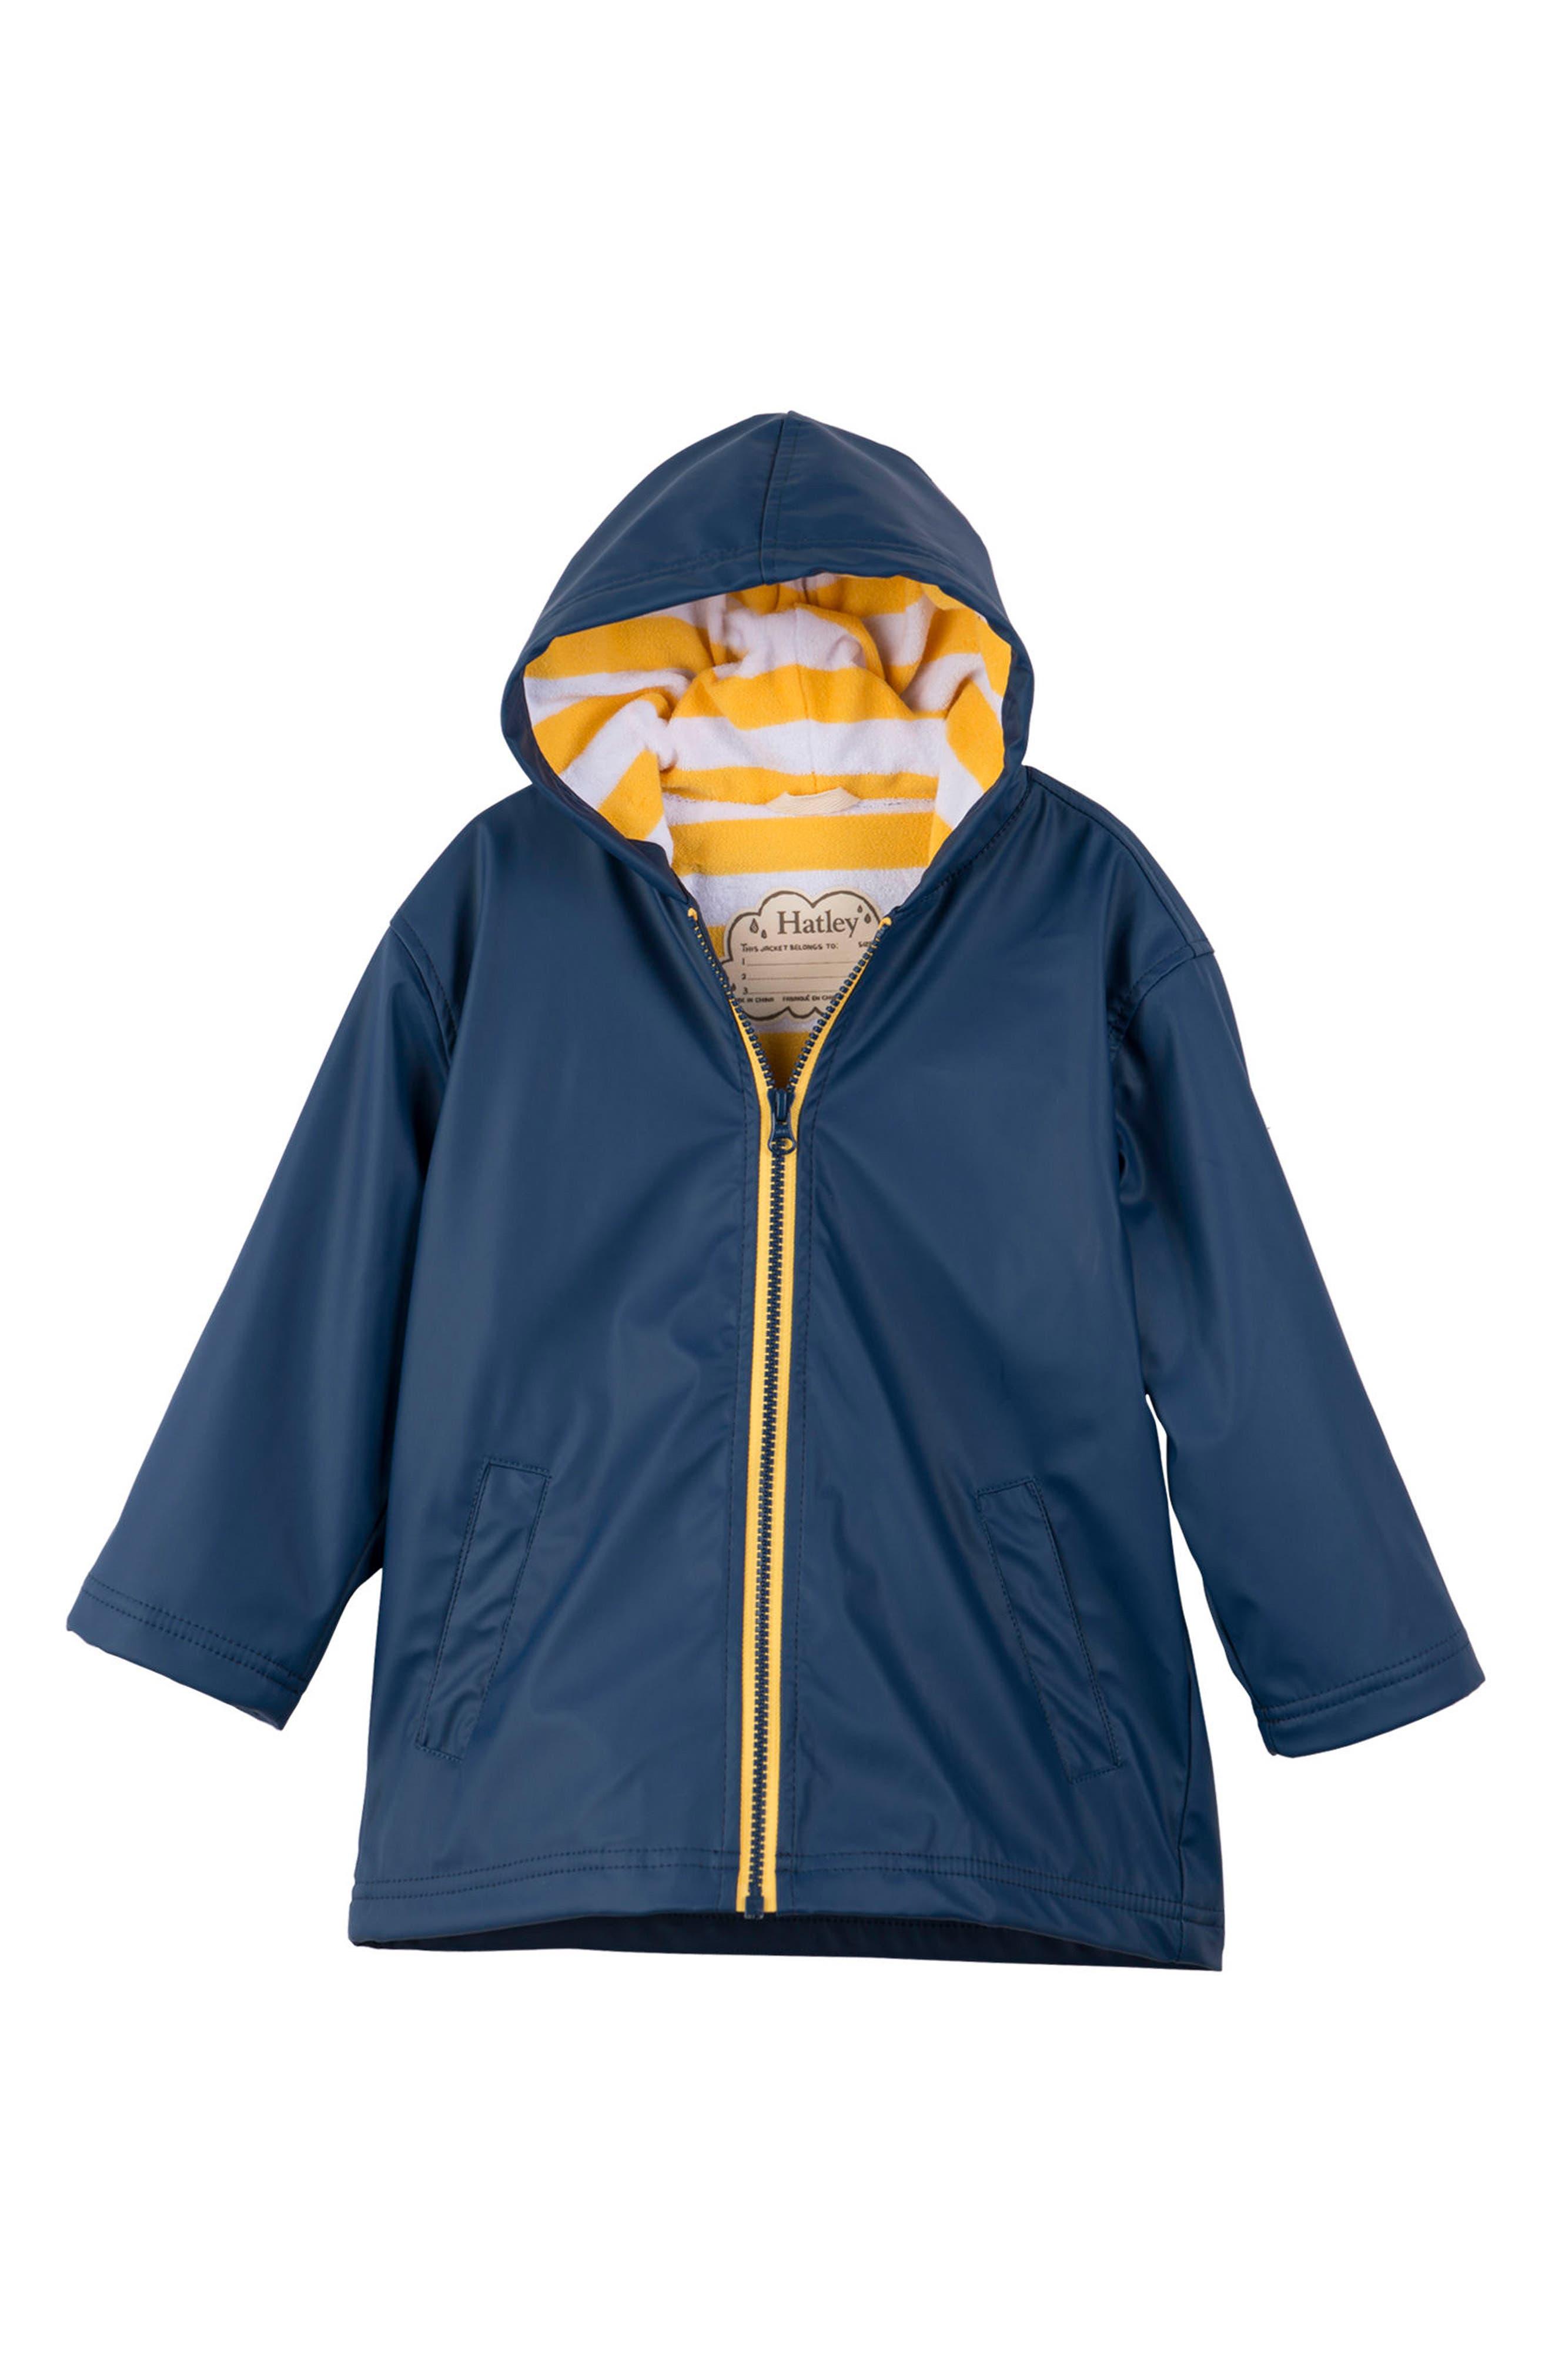 HATLEY Splash Hooded Raincoat, Main, color, NAVY/ YELLOW